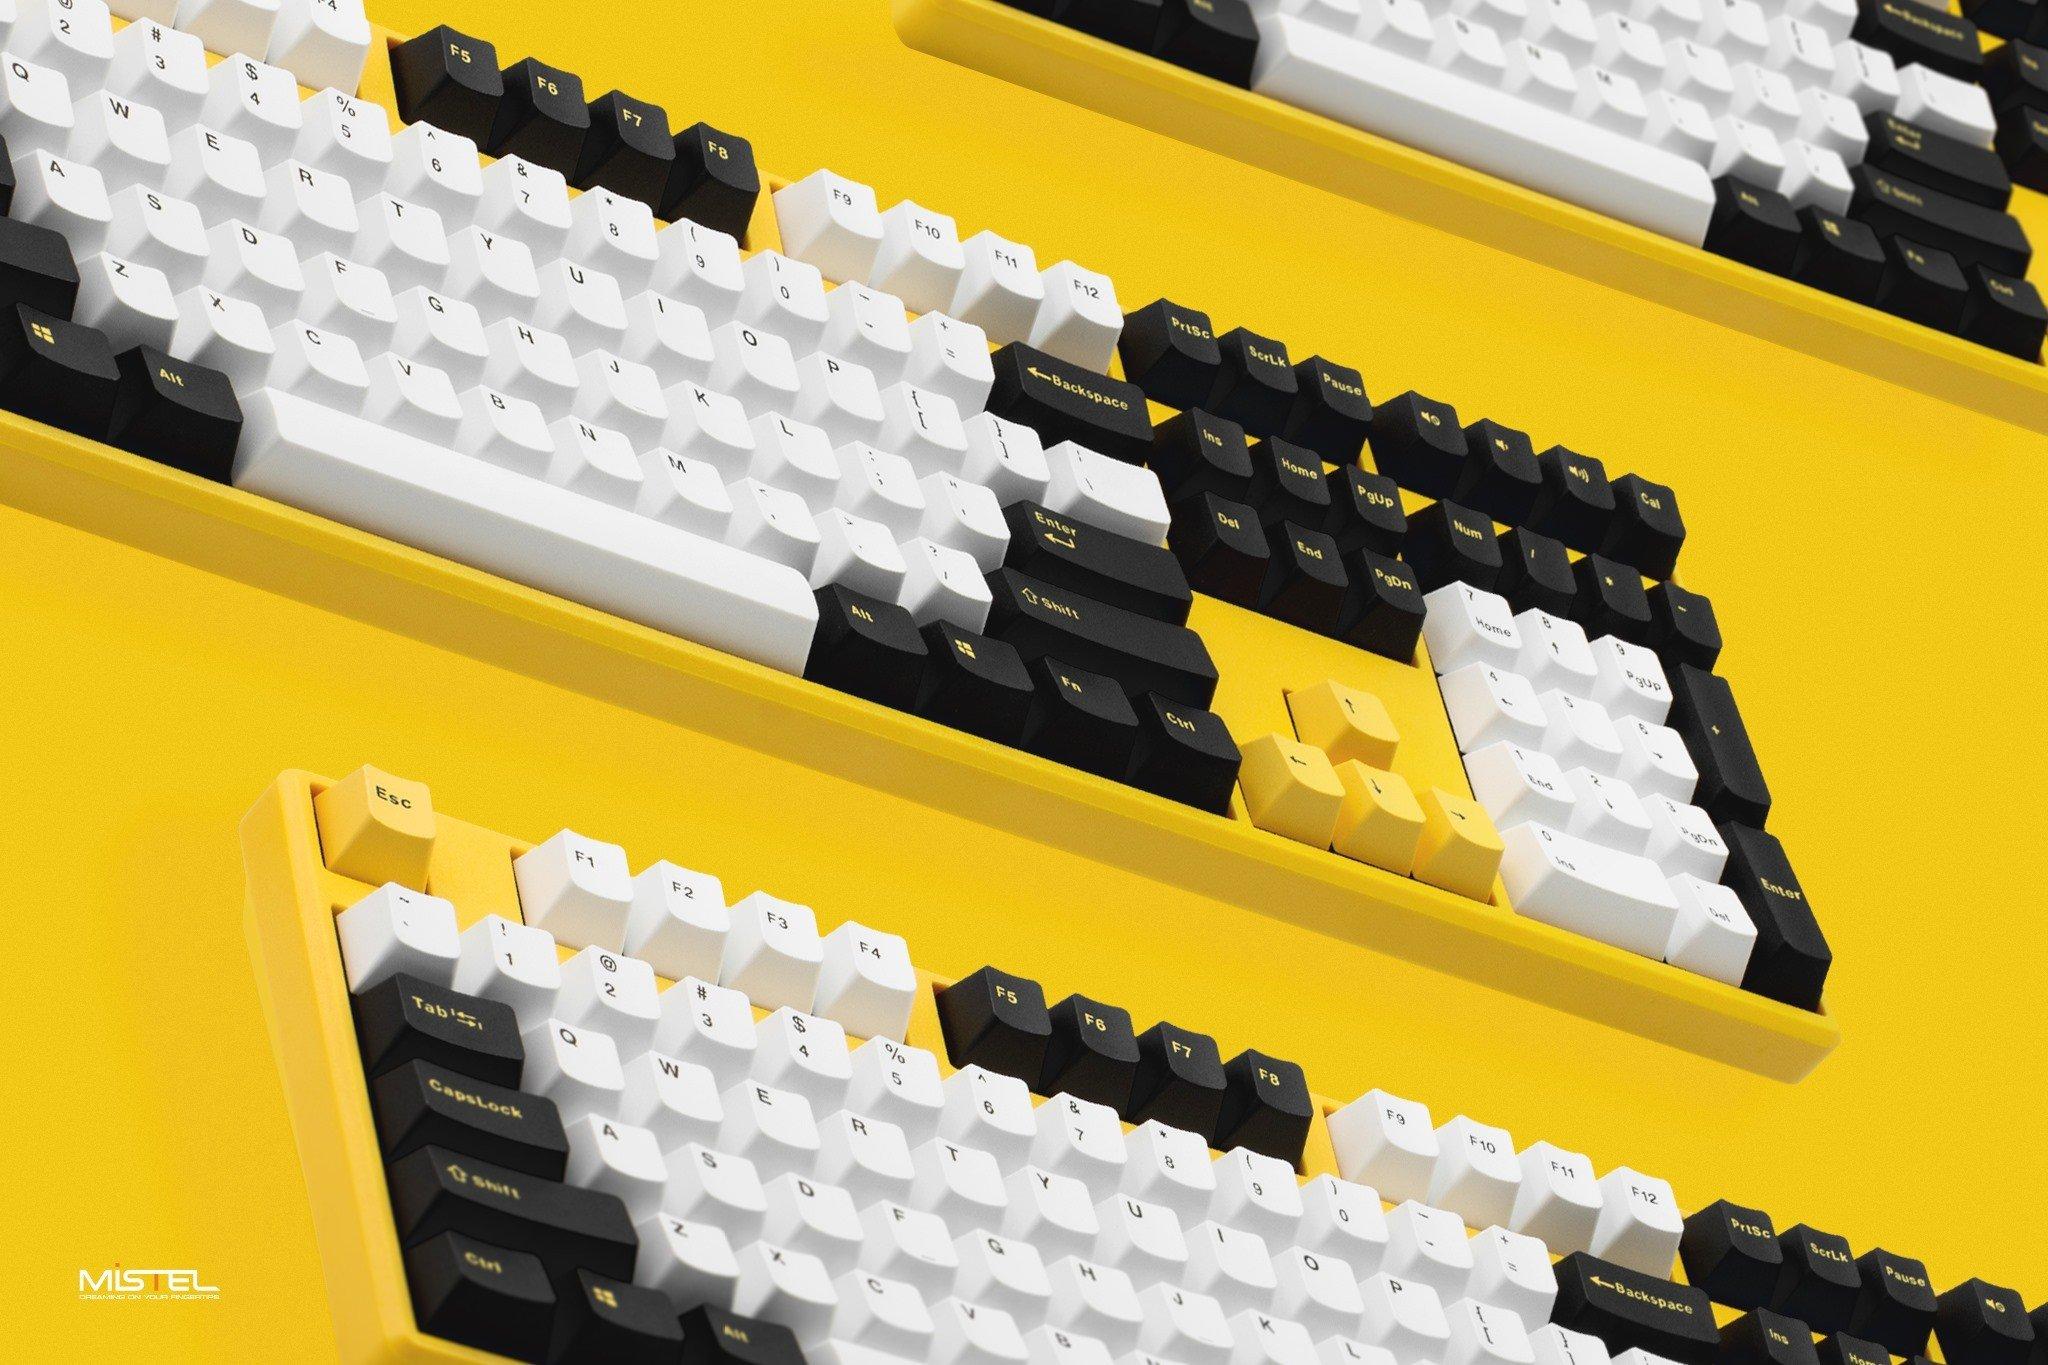 GEARVN.COM - Bàn phím cơ Mistel X8 Bumblebee